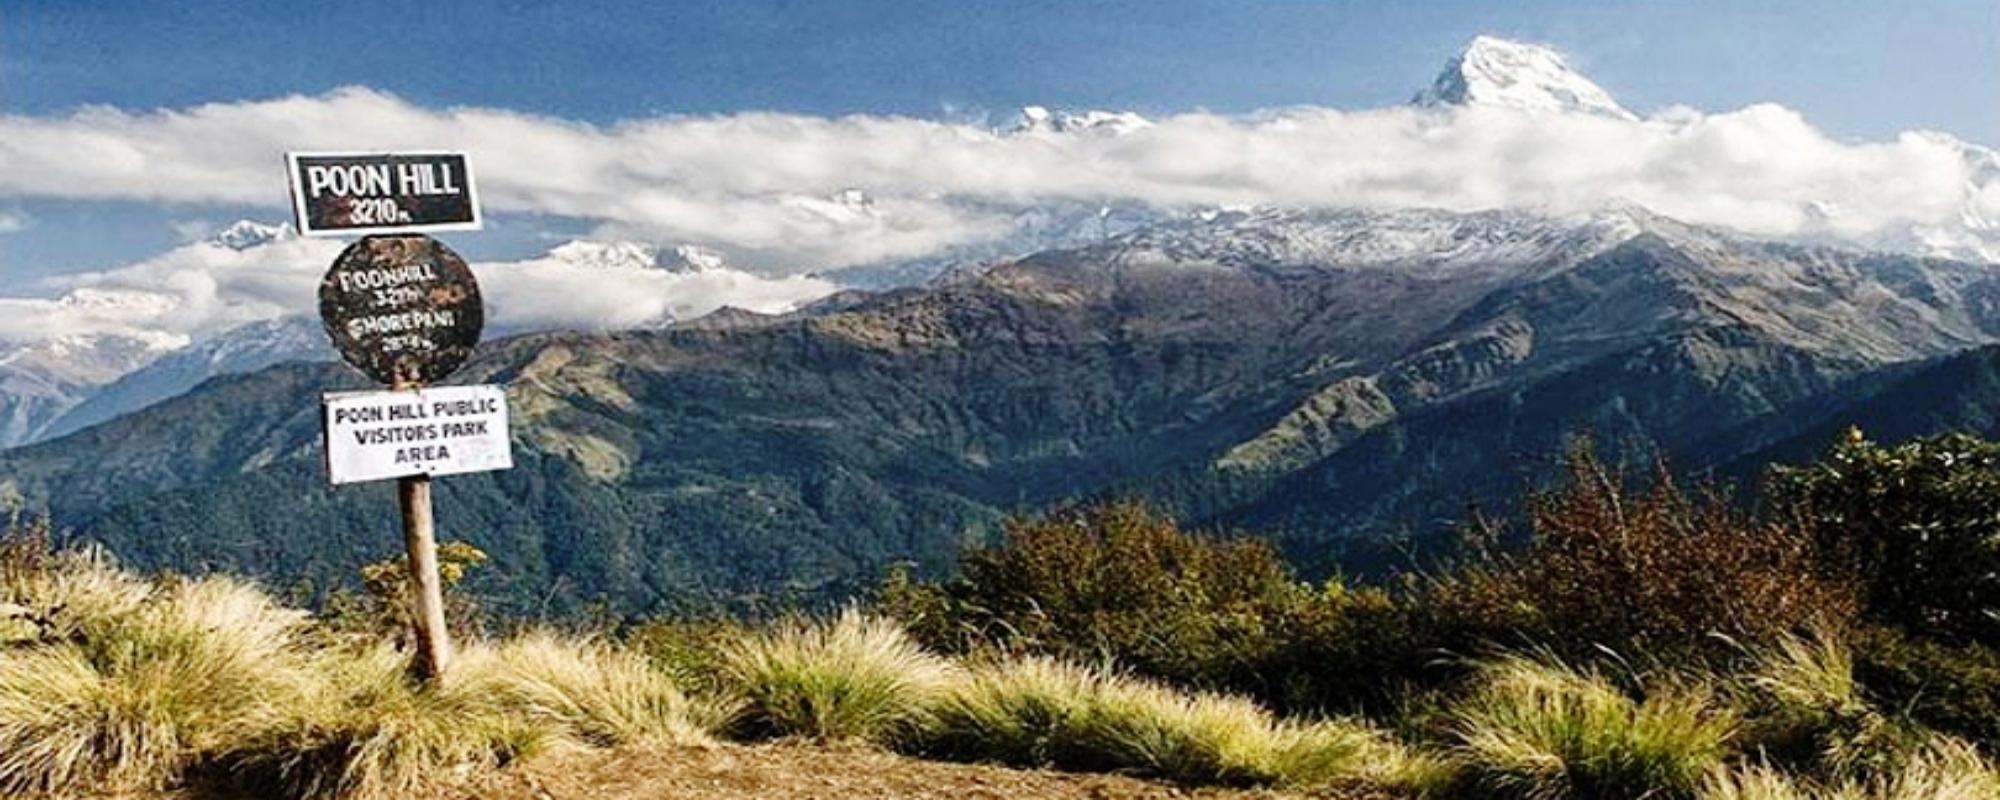 Ghorepani Poon Hill Trek-3 Days